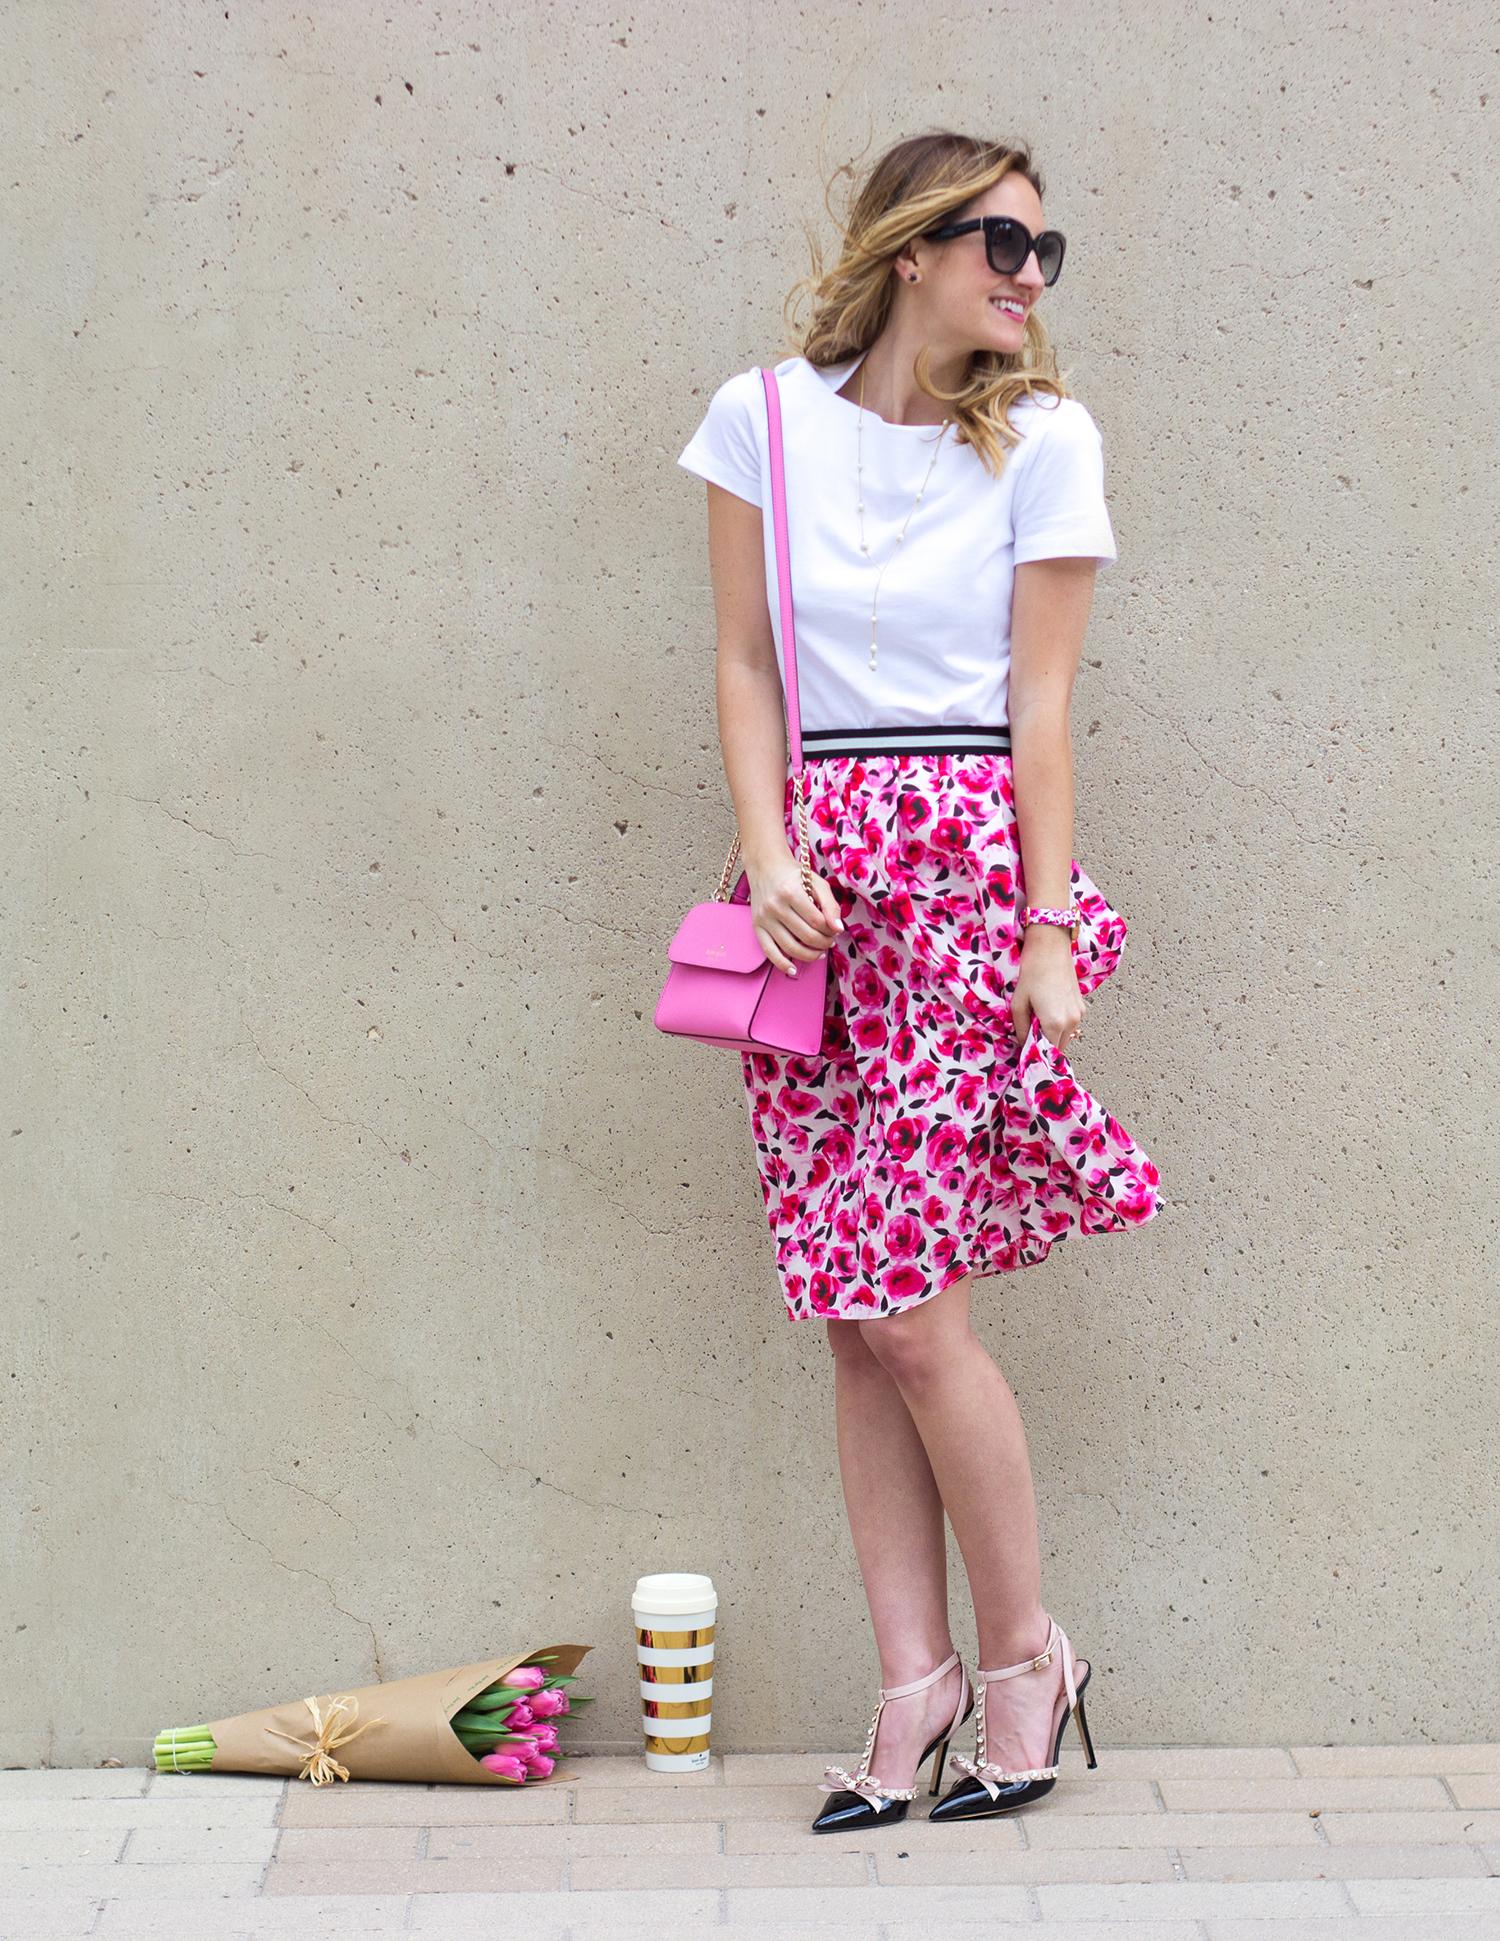 d29324763168 livvyland-blog-olivia-watson-austin-texas-fashion-blogger-